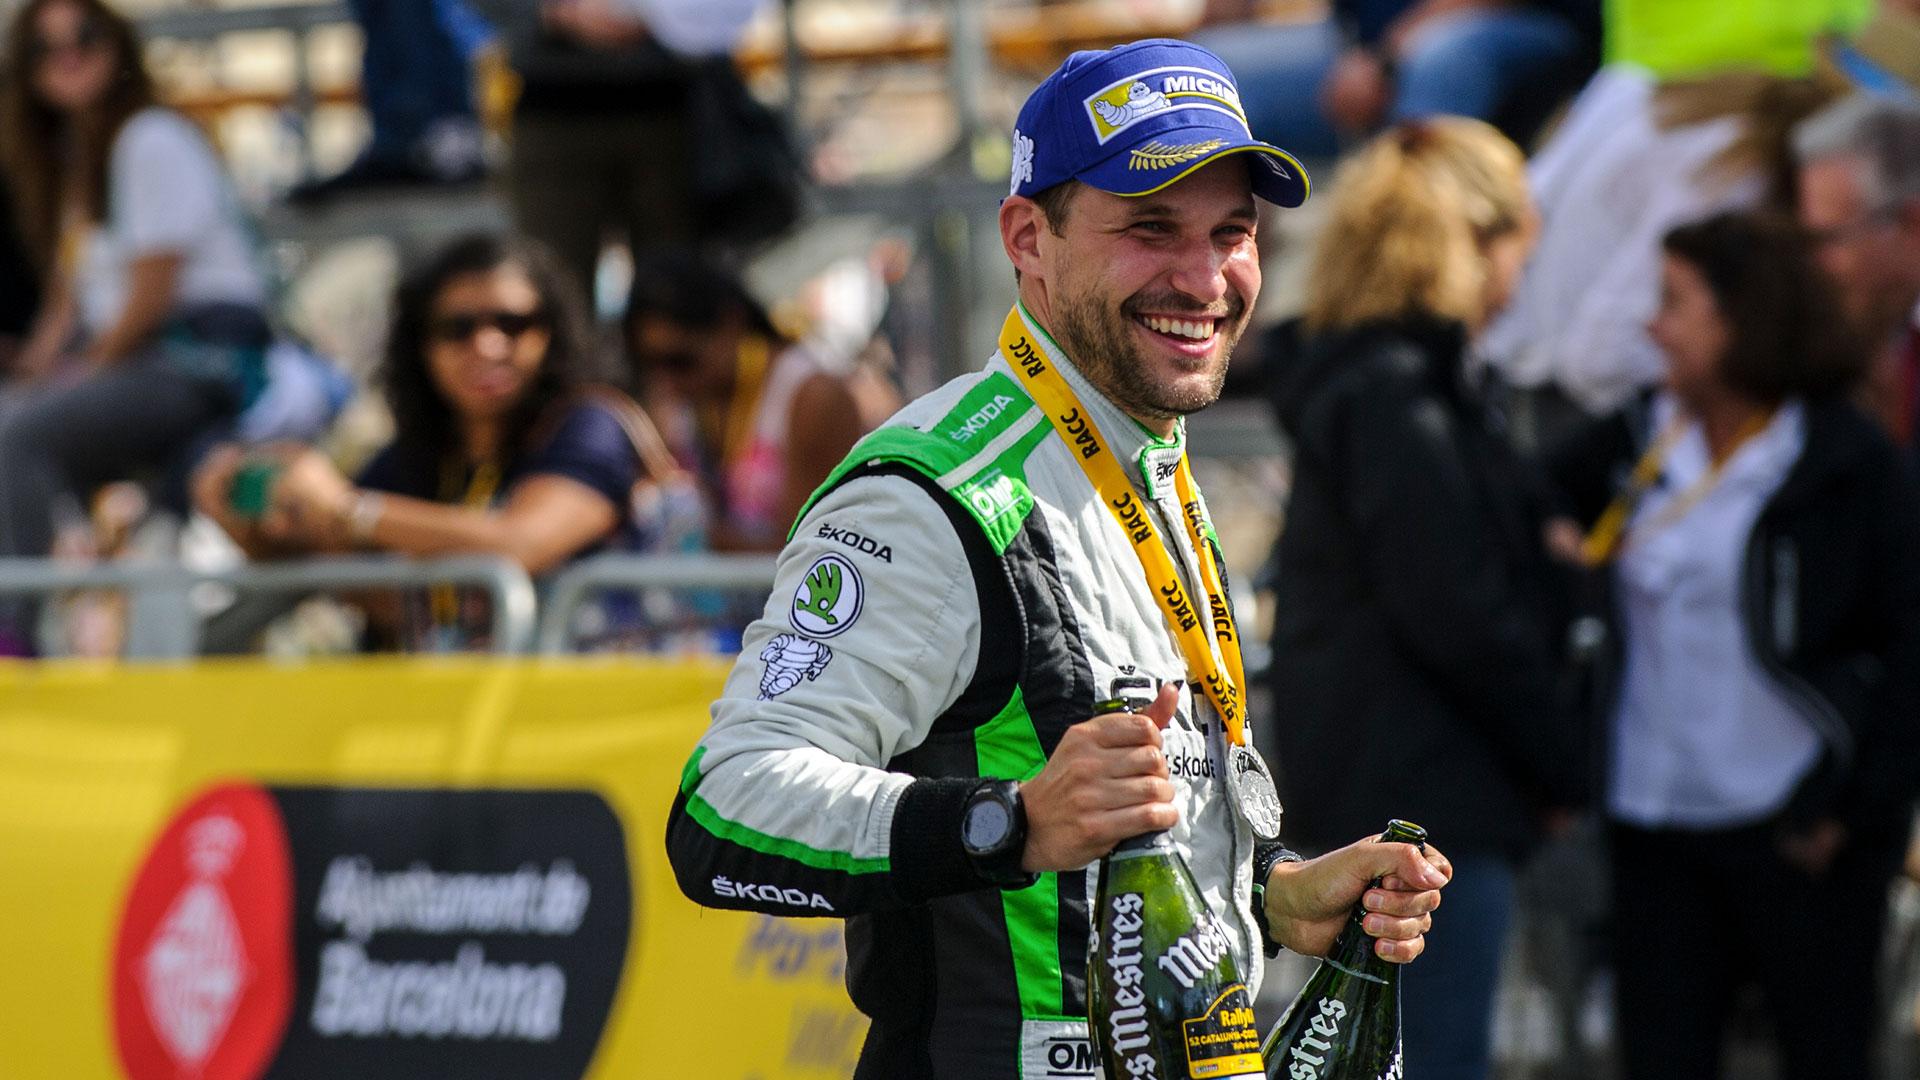 Pavel Dresler, ŠKODA FABIA R5, ŠKODA Motorsport. RallyRACC Catalunya - Costa Daurada 2016